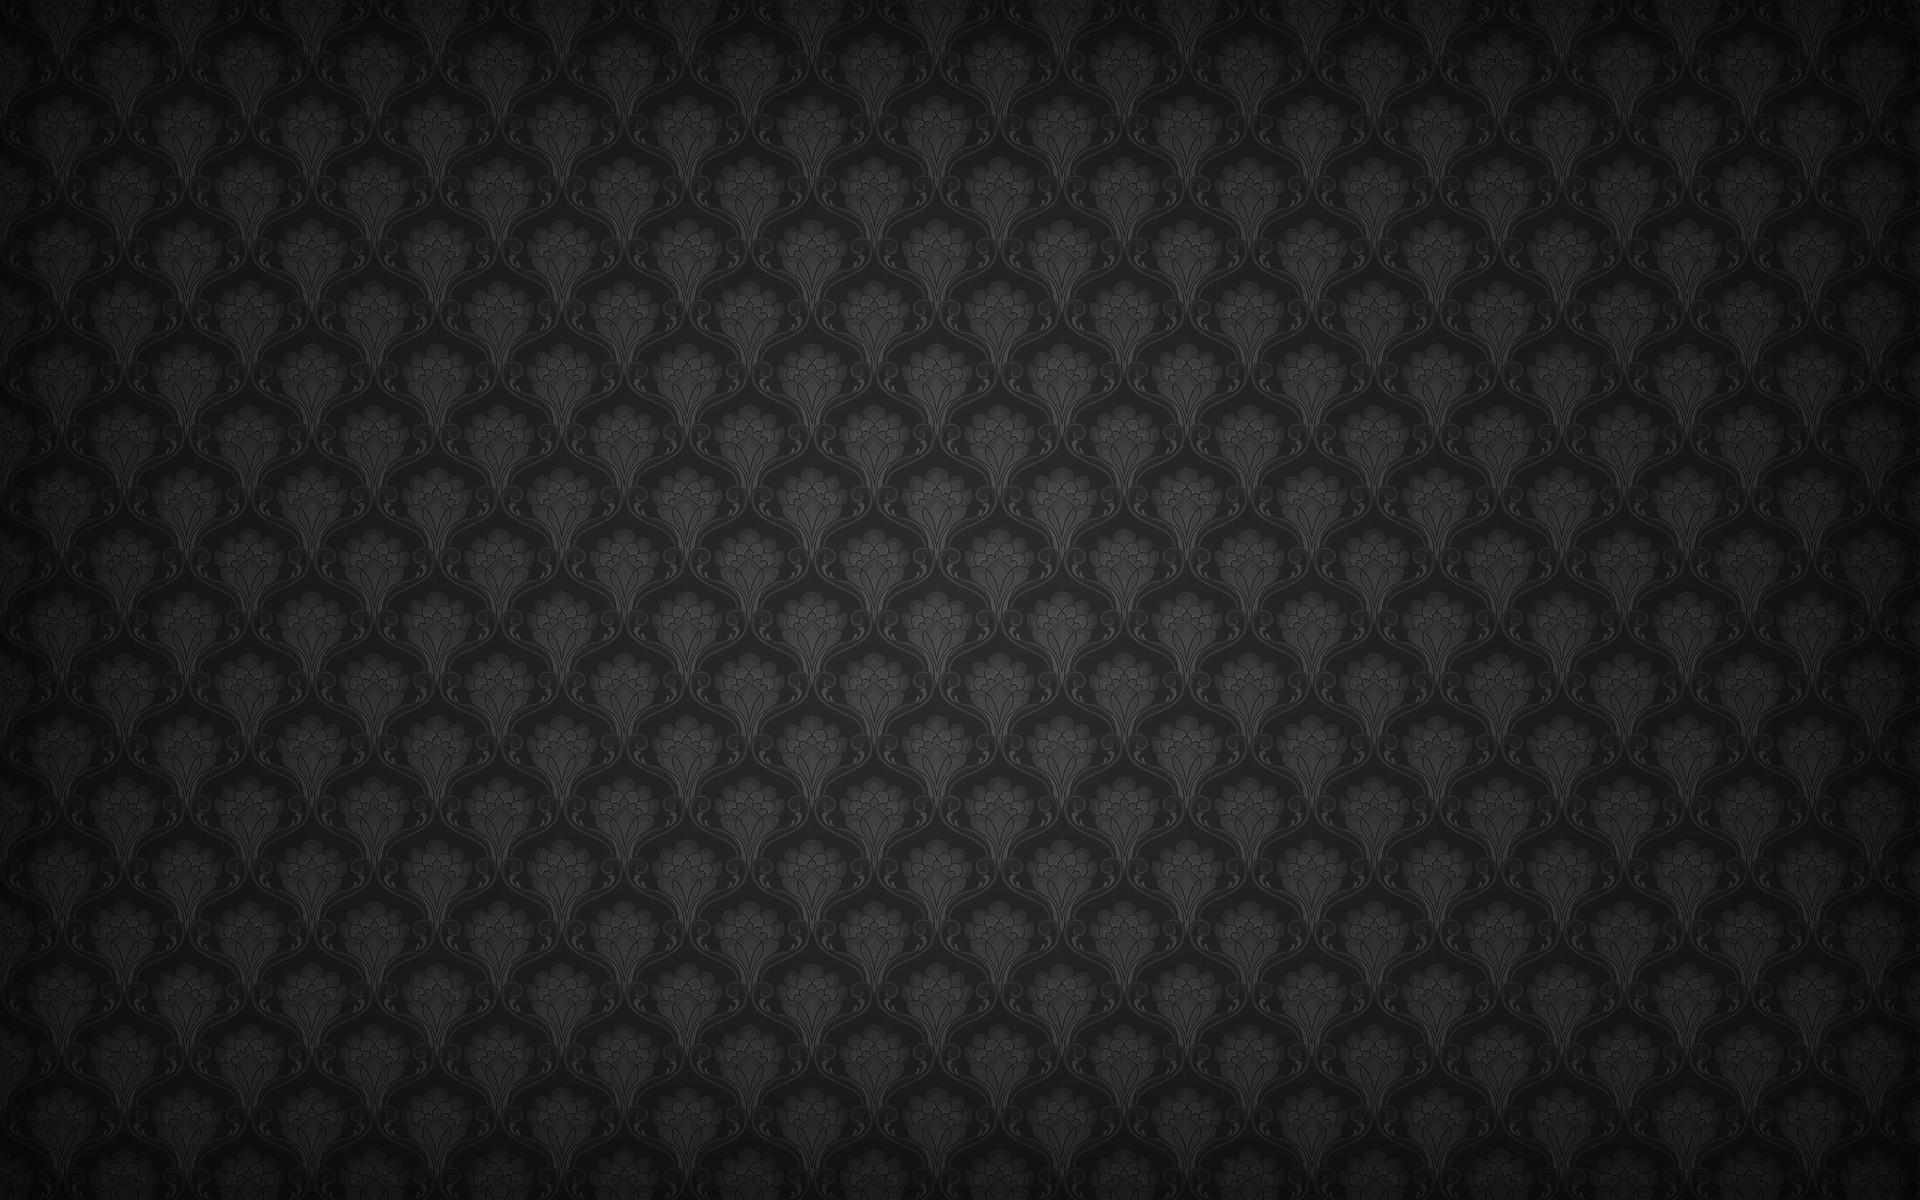 Vintage wall pattern wallpaper   94289 1920x1200